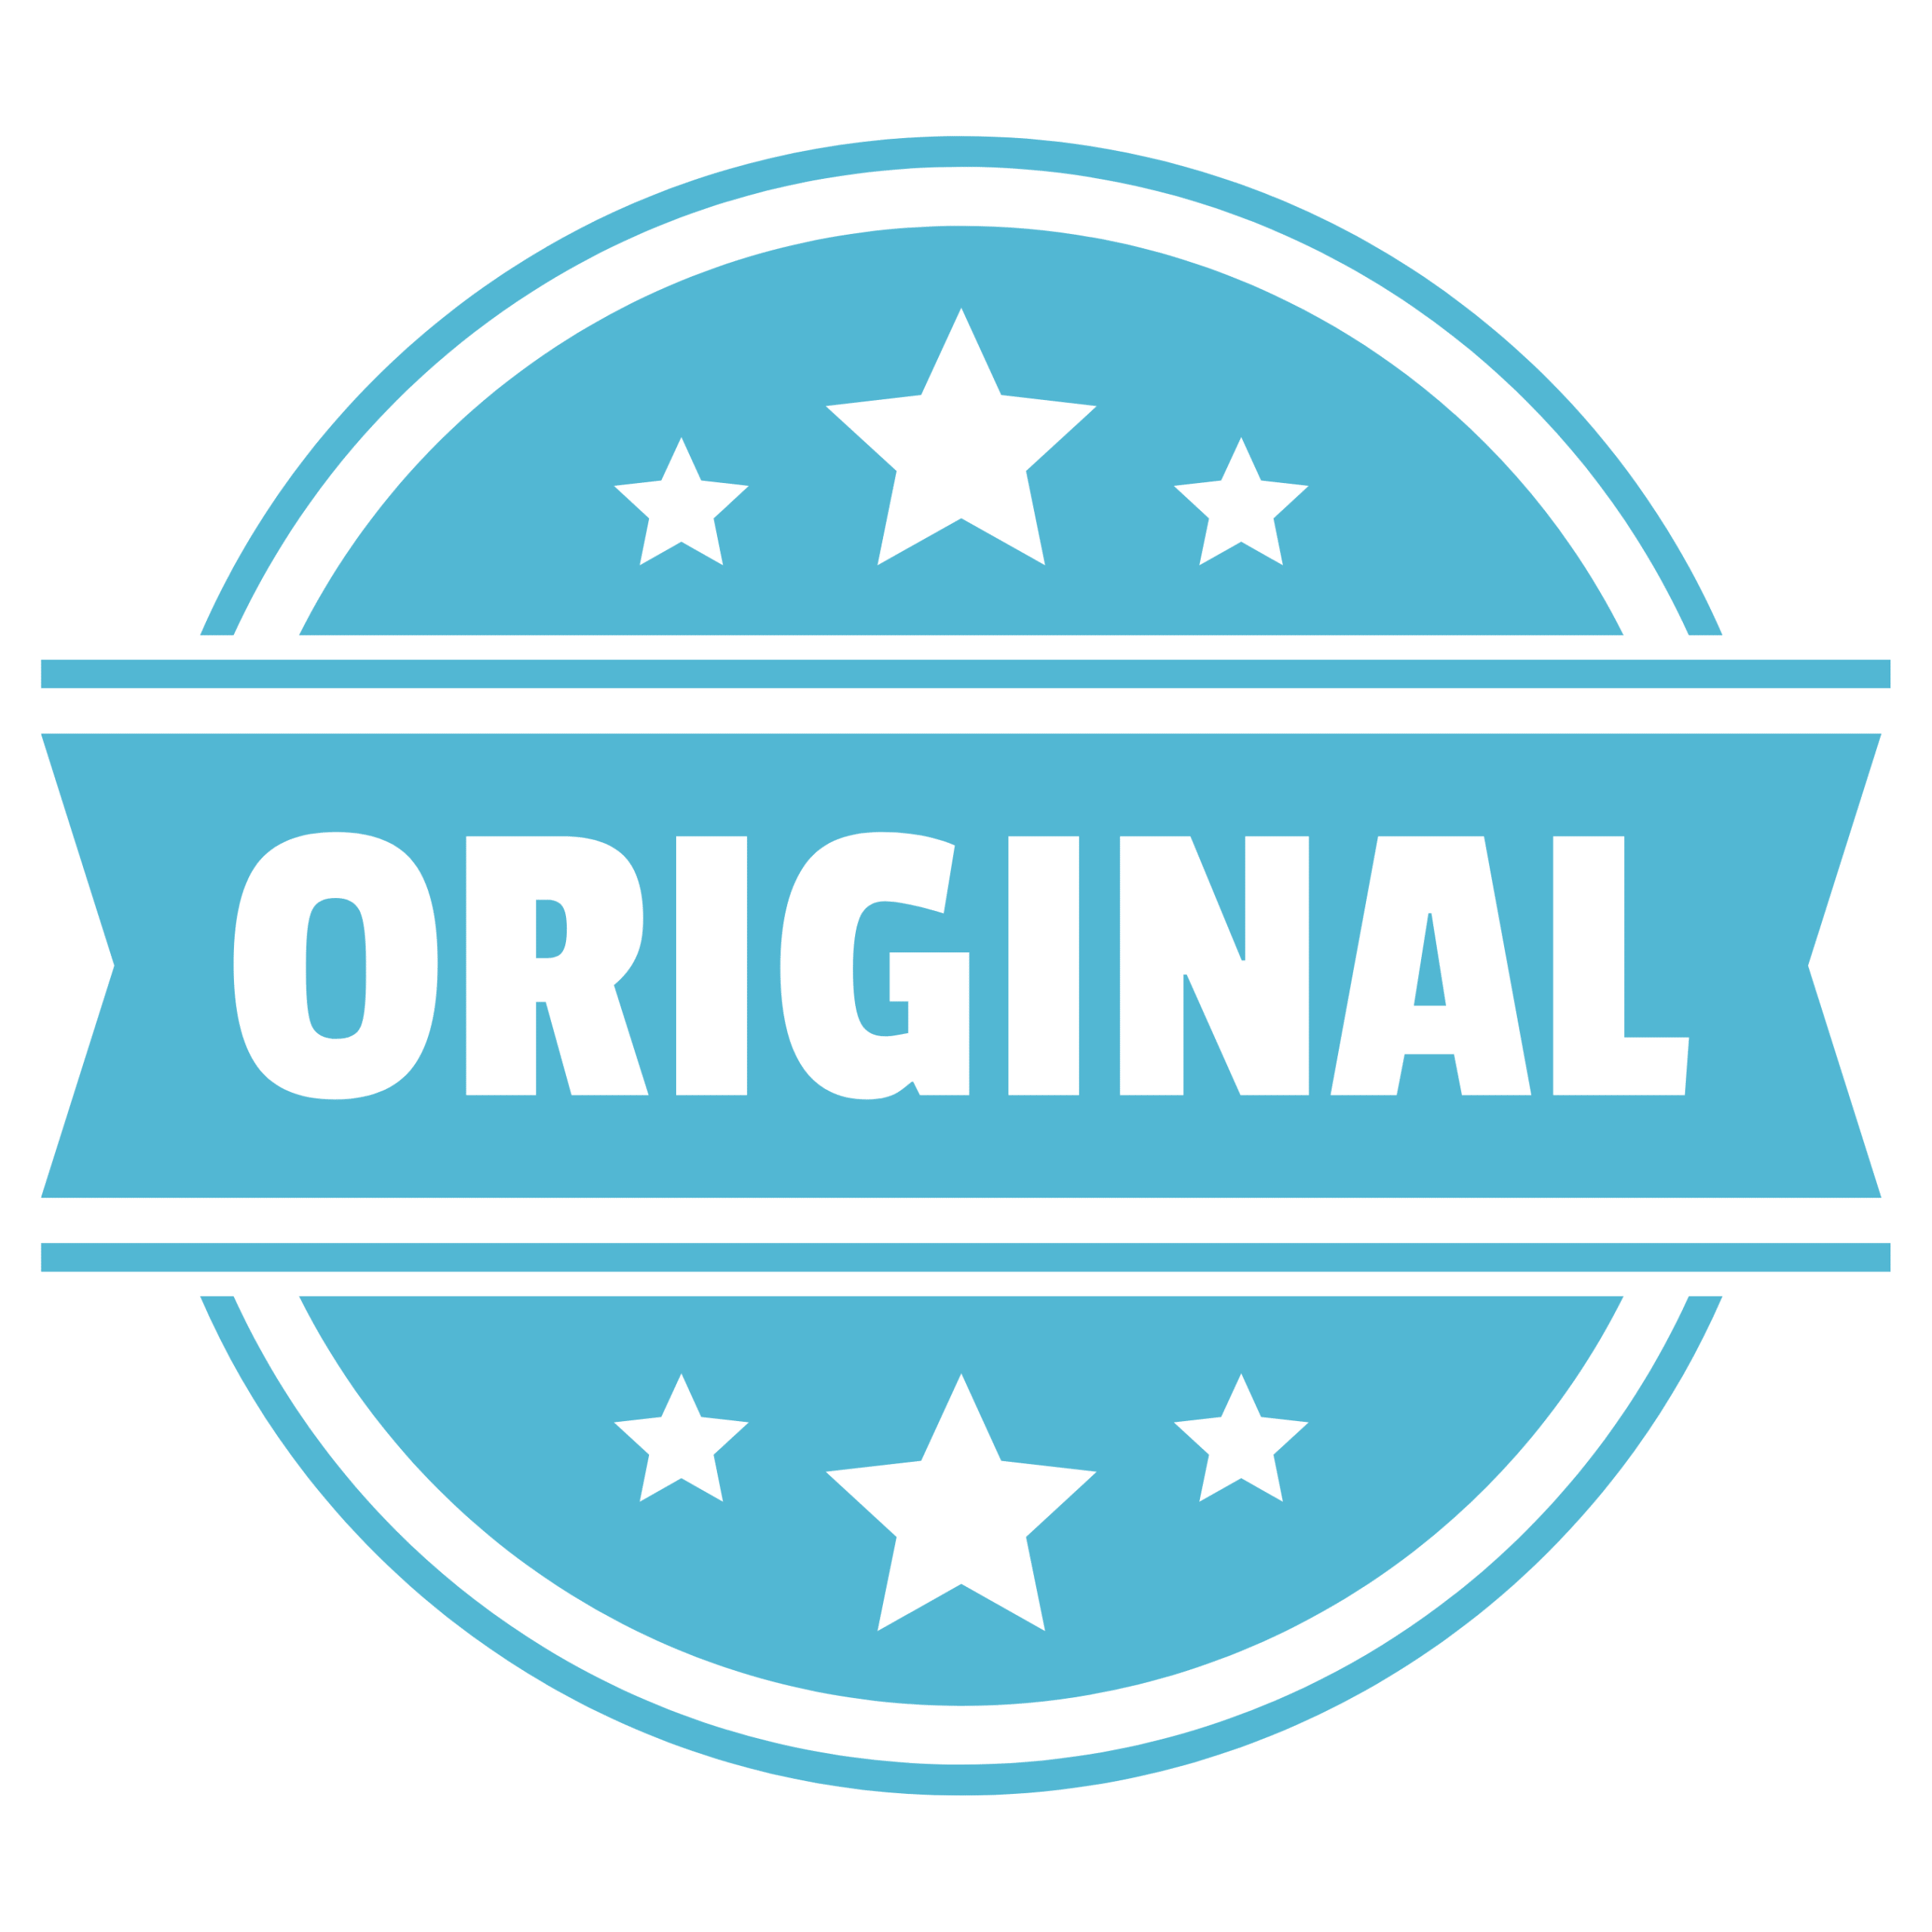 producto original